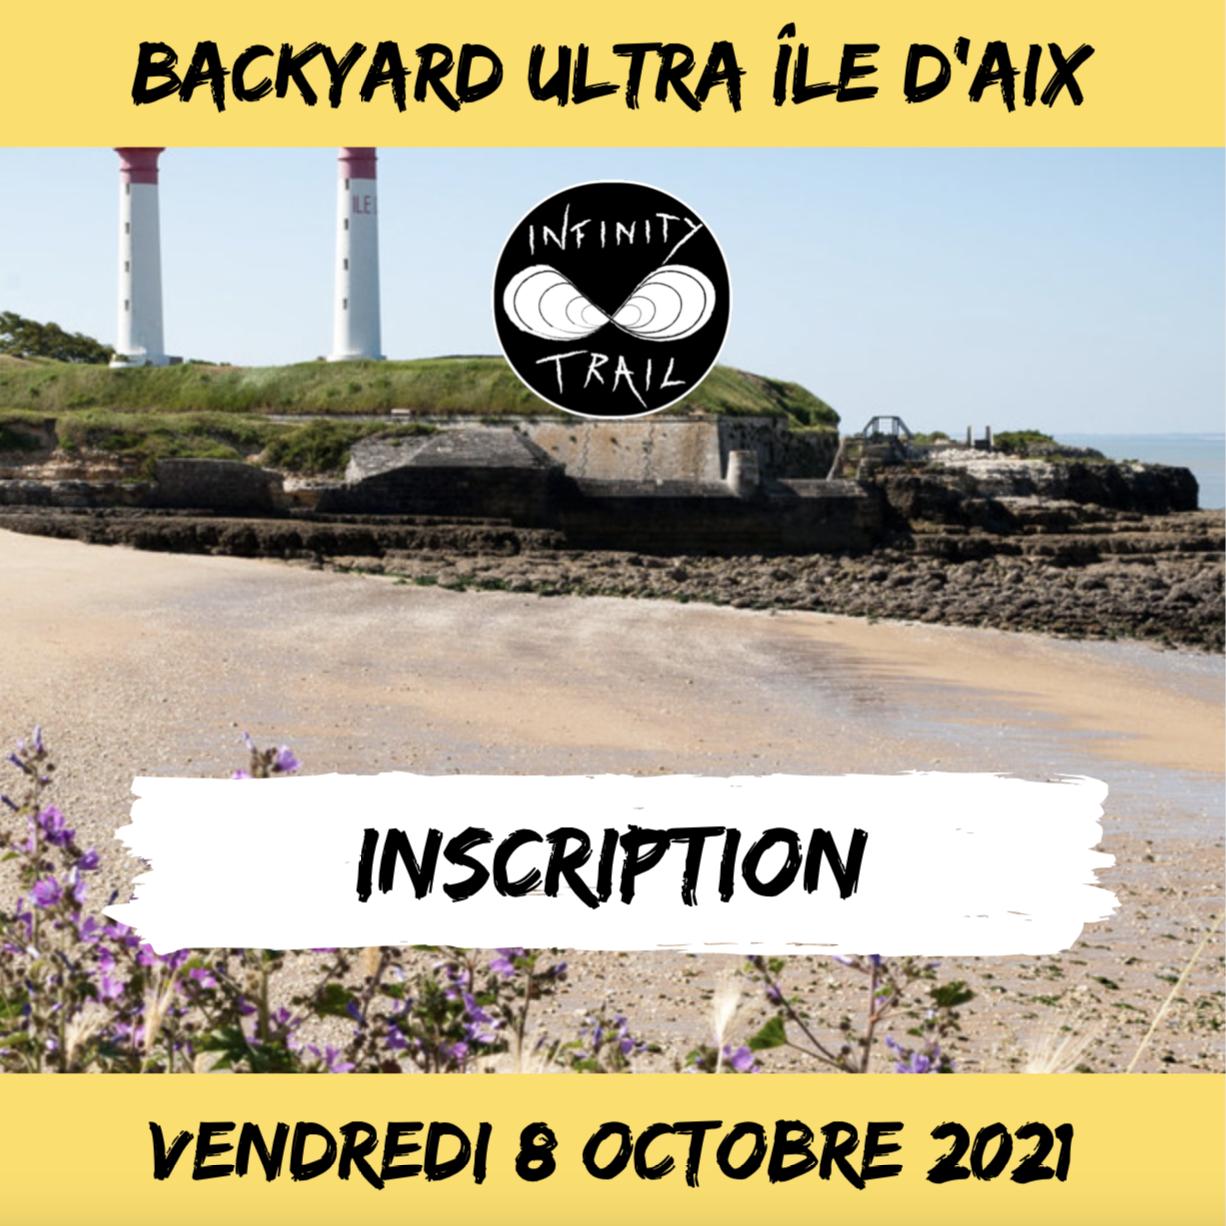 backyard ultra Ile d'Aix